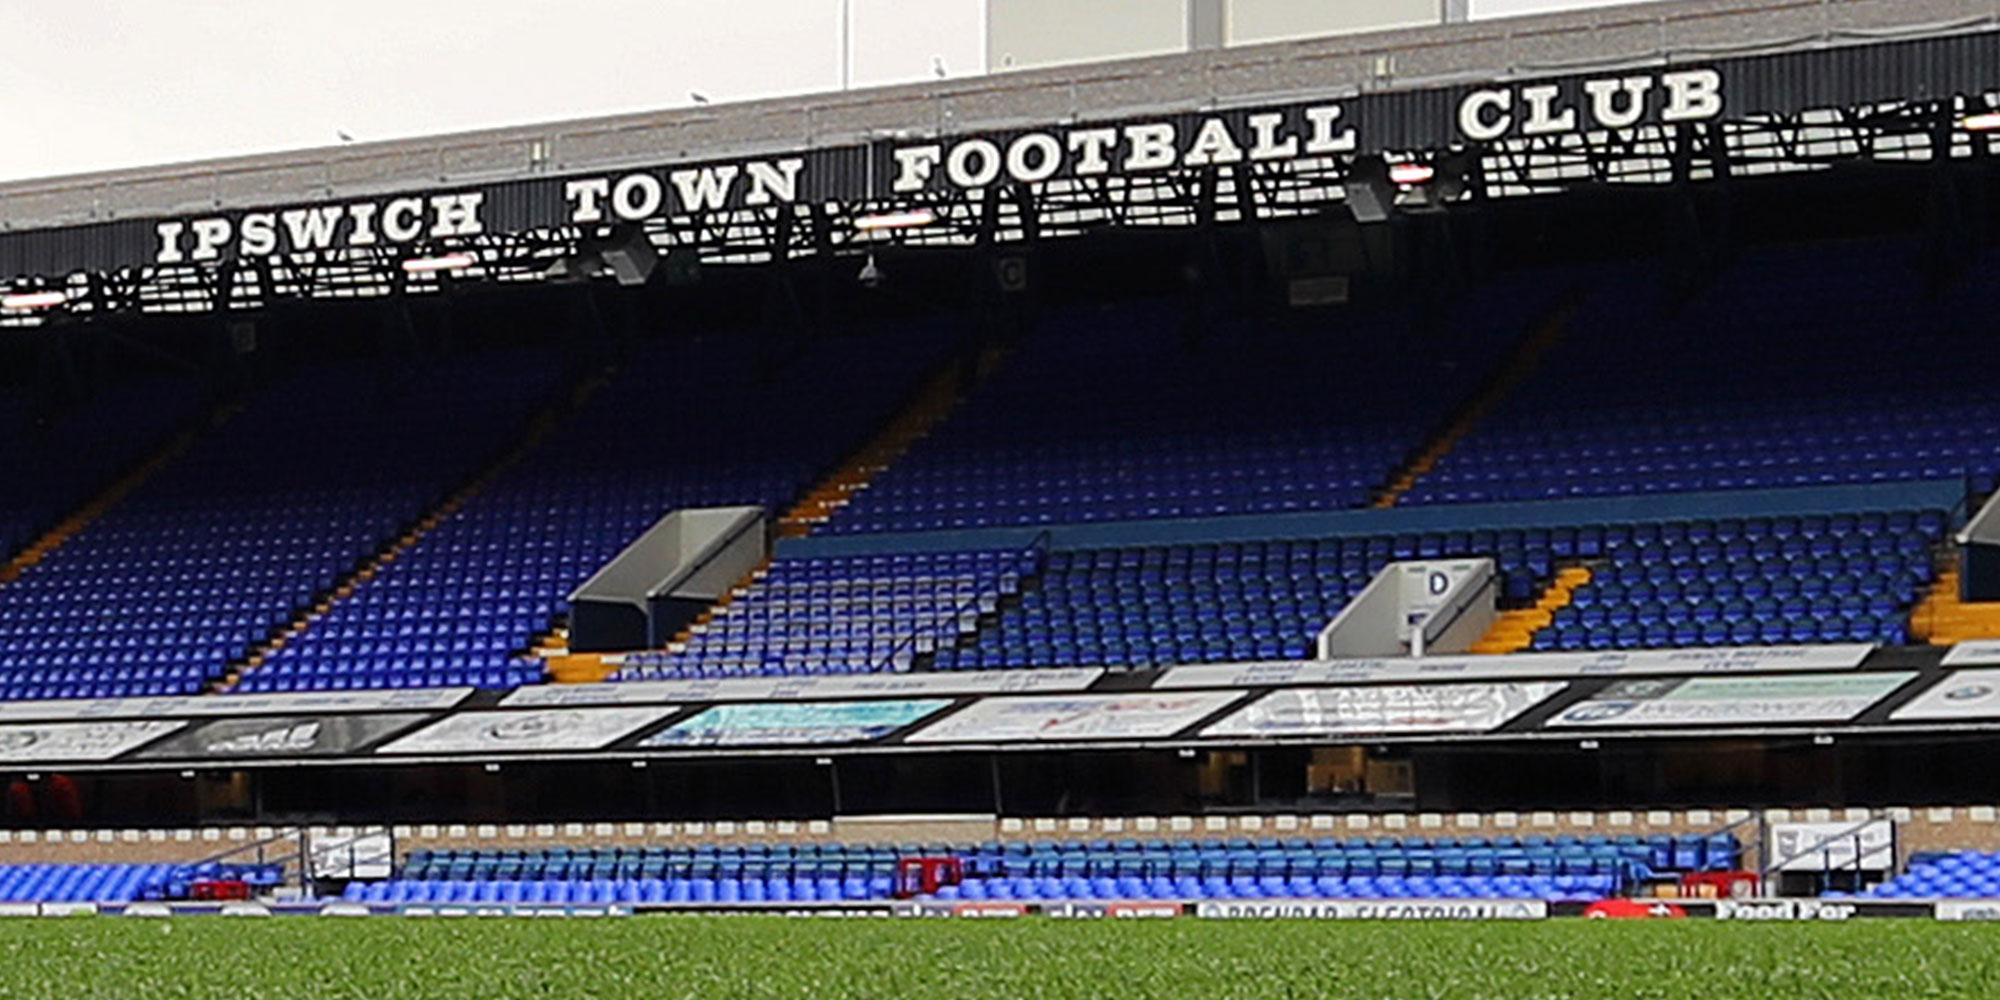 Ipswich Town v Rotherham United